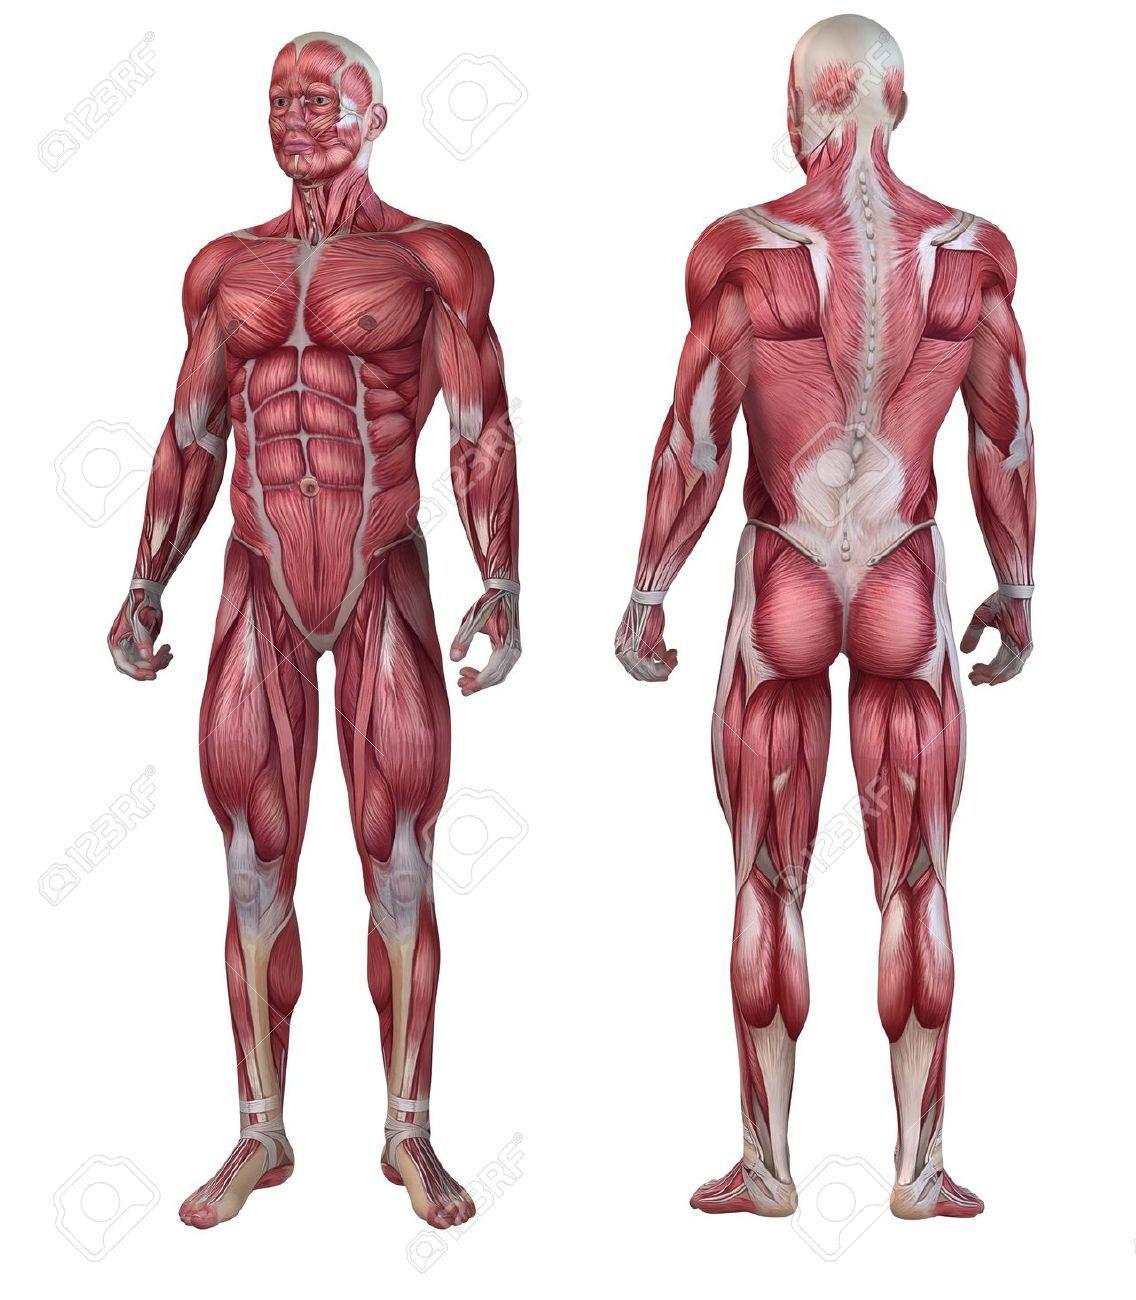 Sistema muscular masculino. | Anatomía Humana. Human anatomy ...